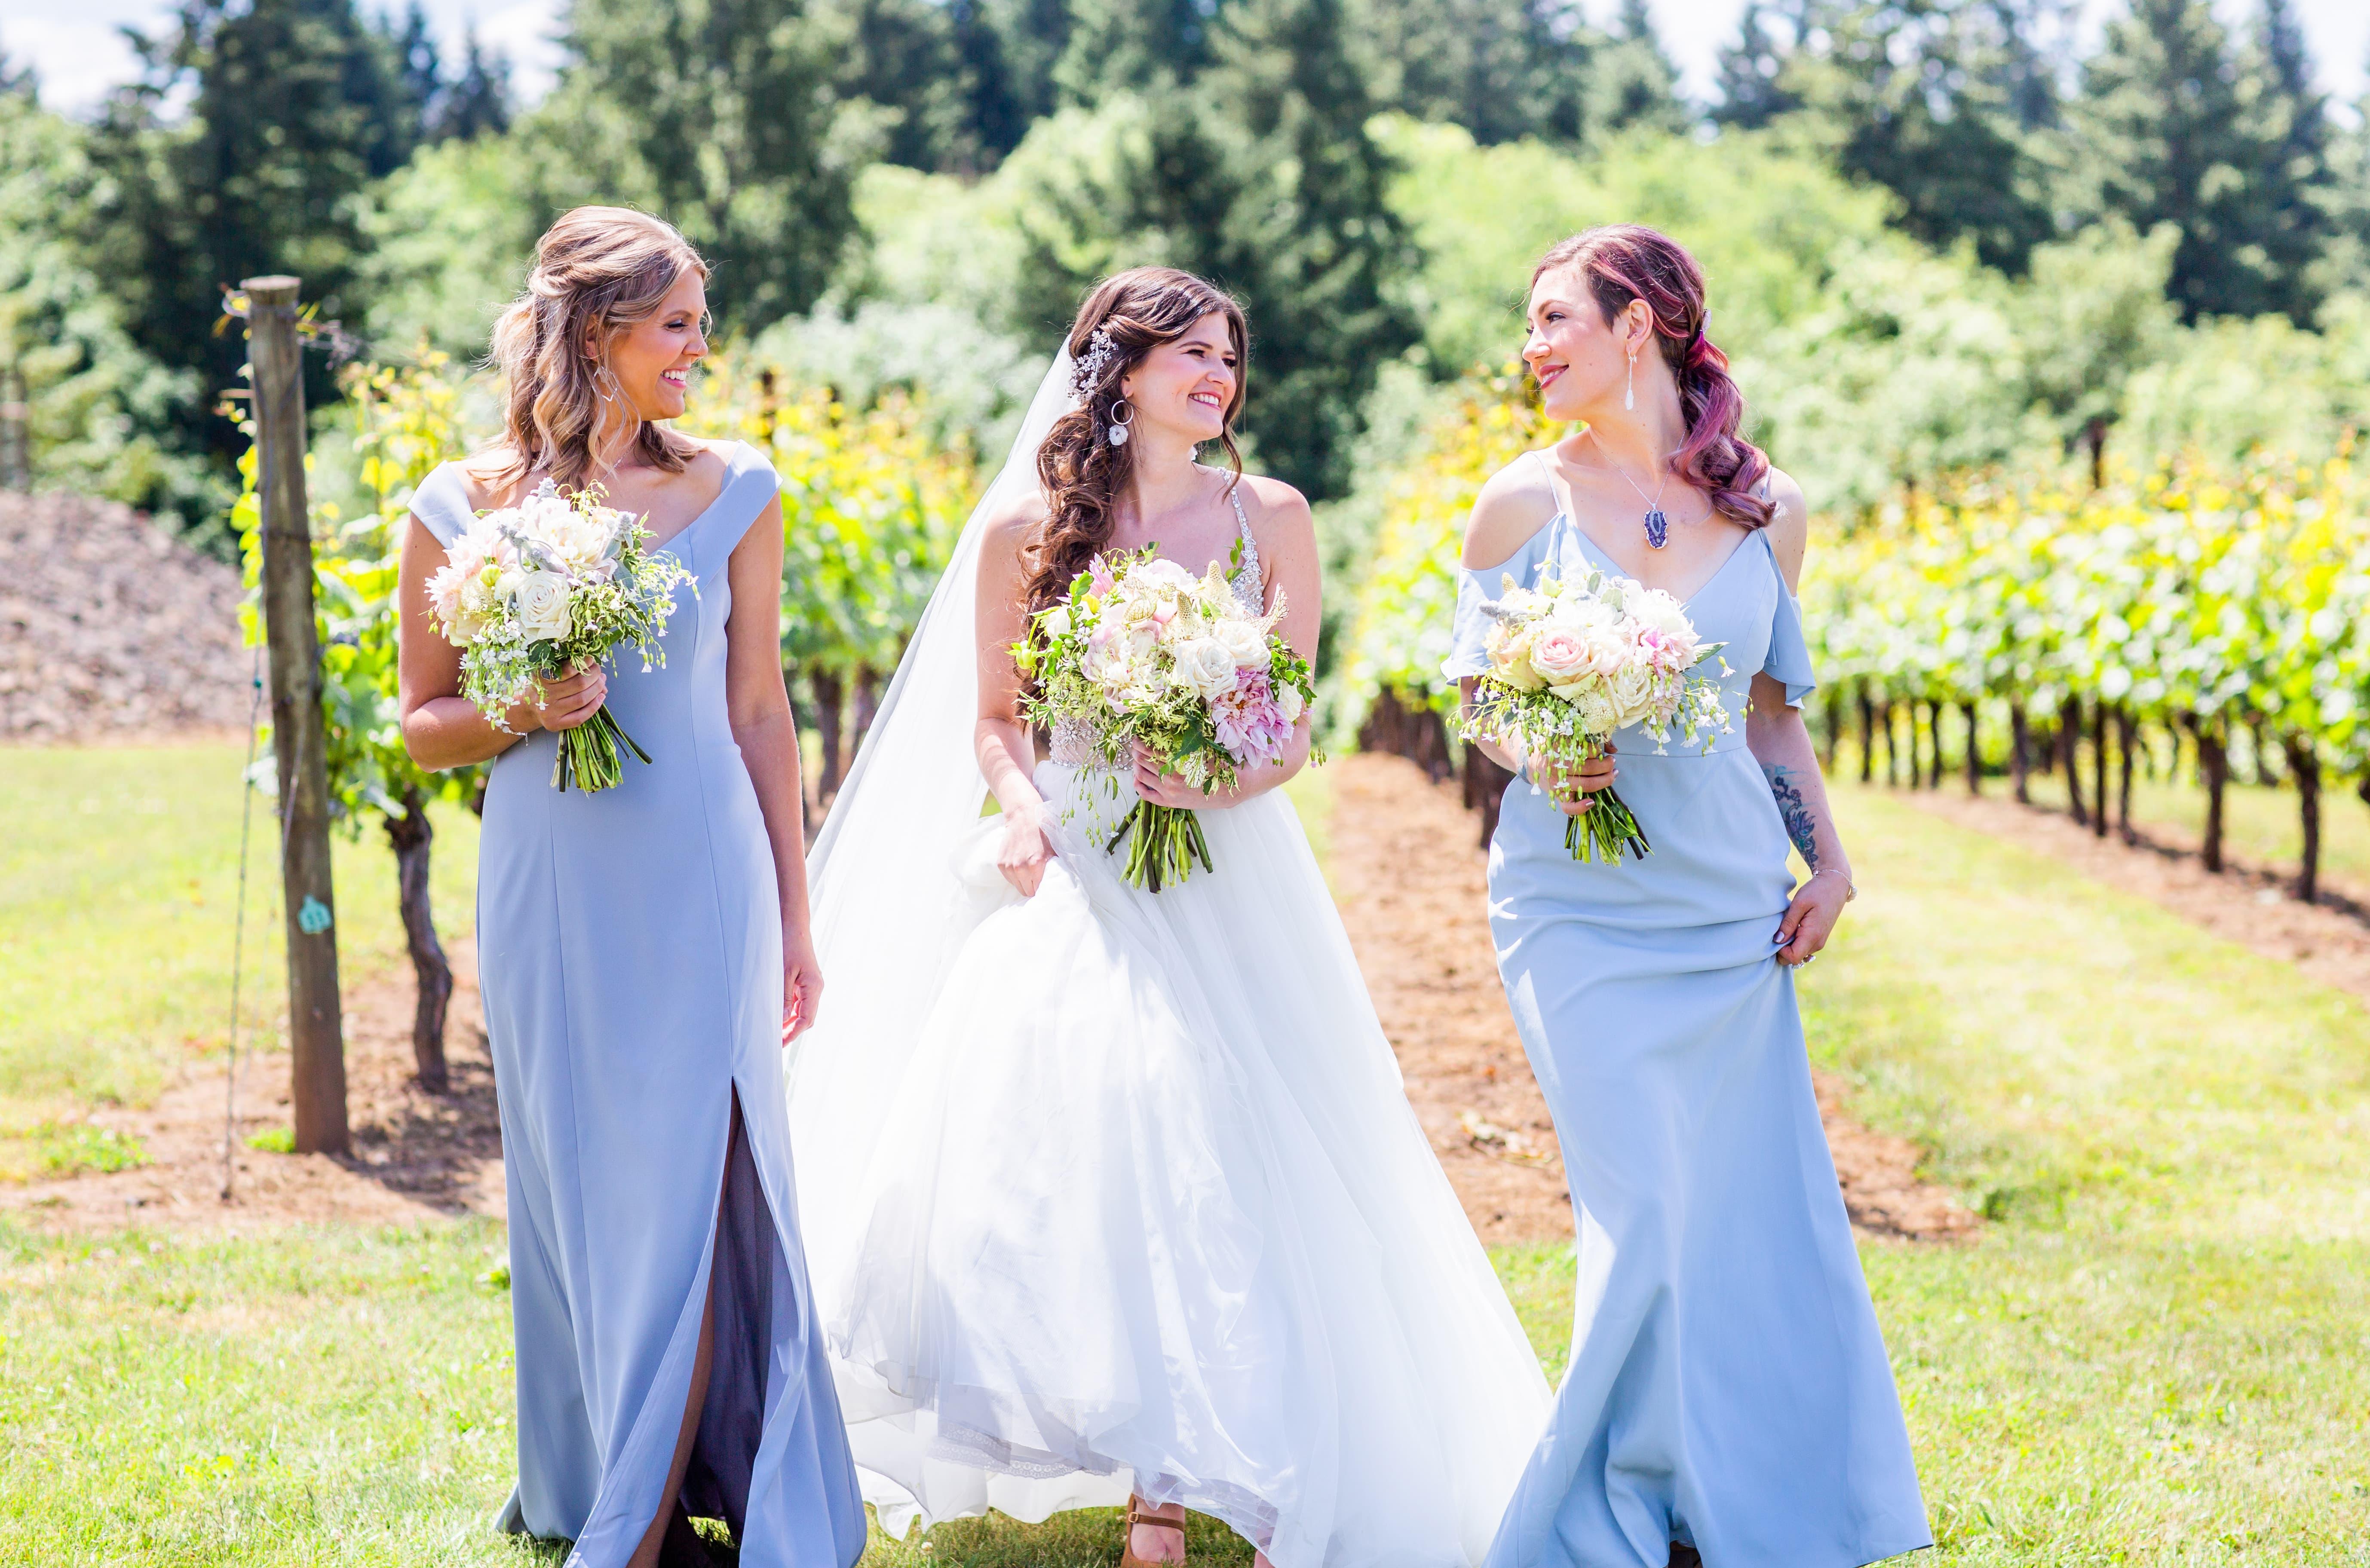 Oswego-Hills-Wedding-photo Corina Silva Studios-111-min